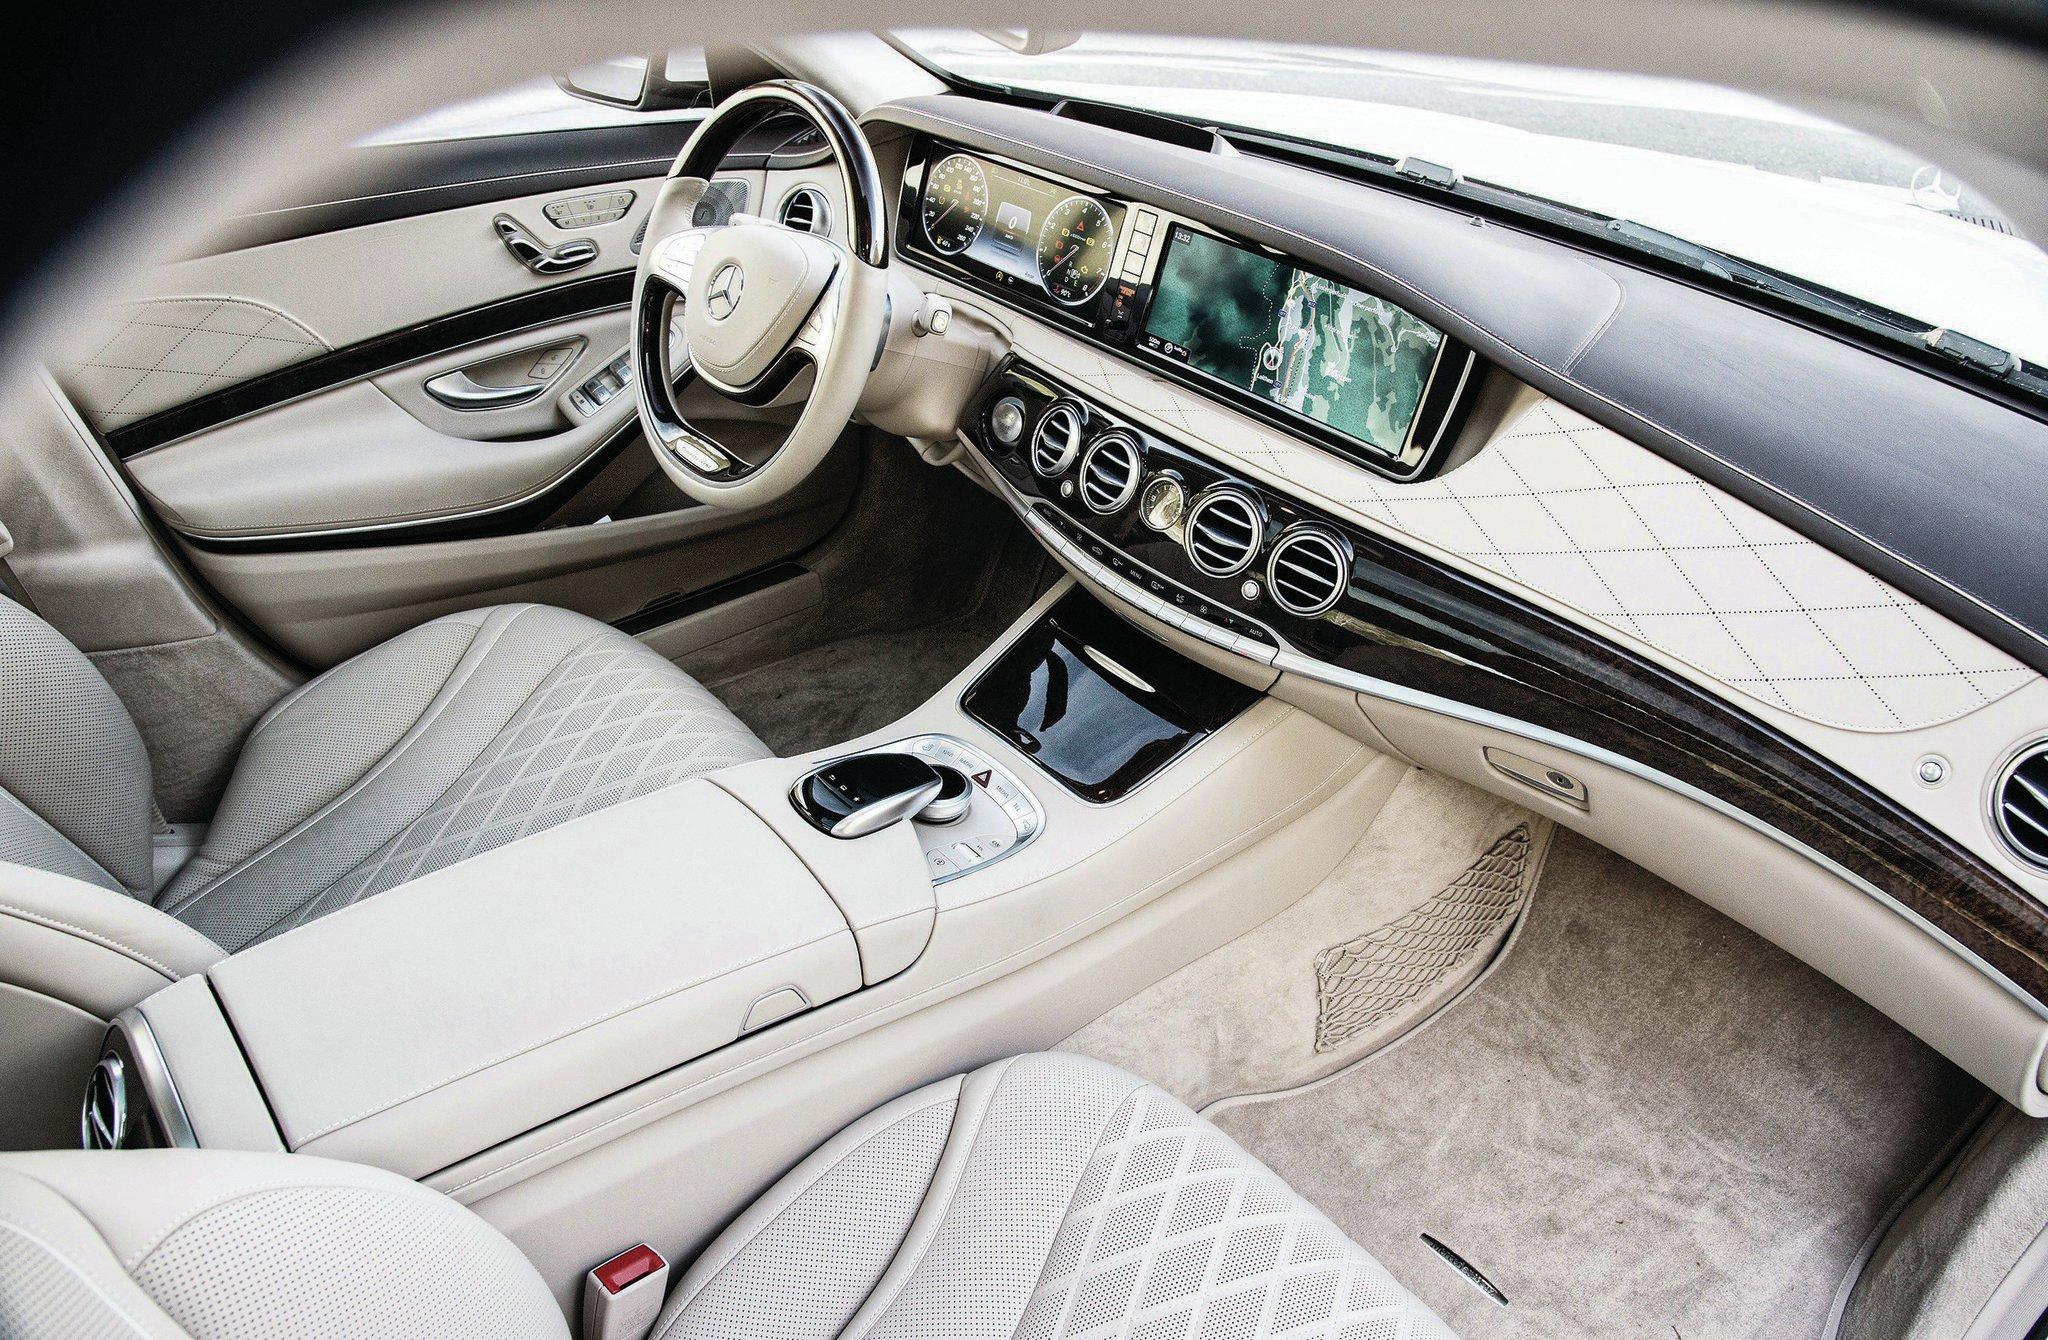 2016 Rolls Royce Ghost >> Bentley Flying Spur vs. Mercedes-Benz S600 vs. Rolls-Royce Ghost Series II